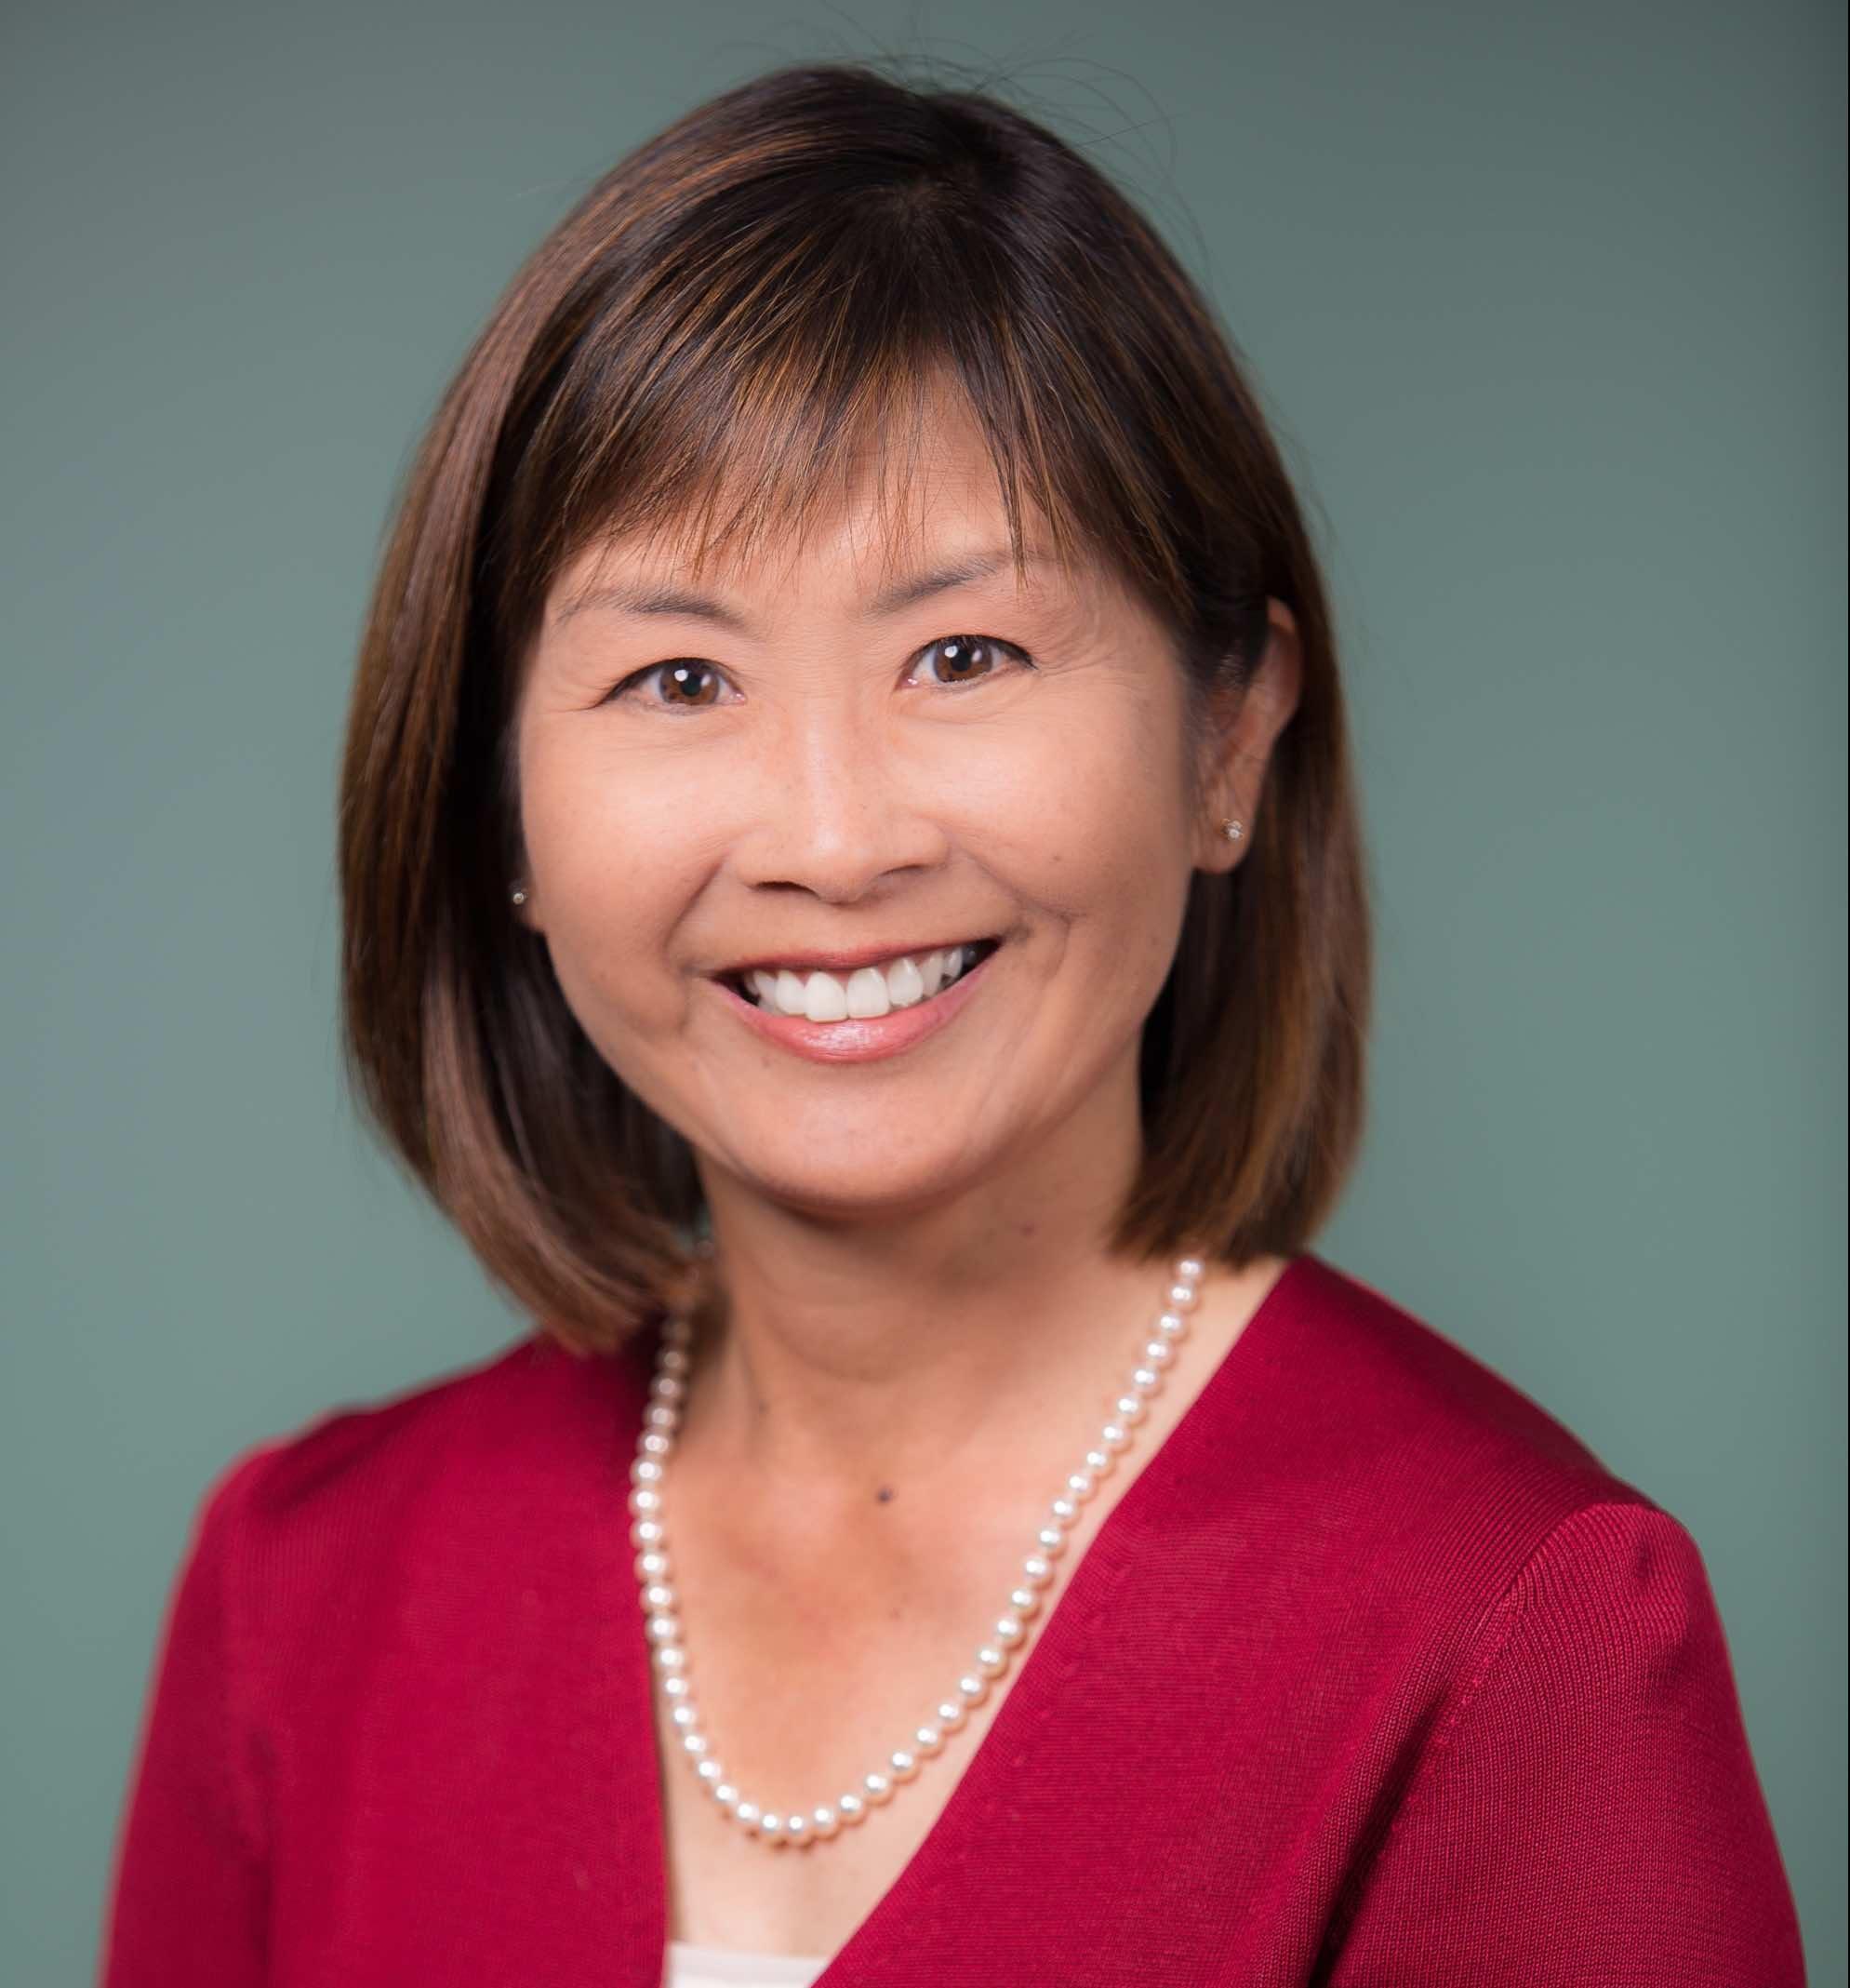 Portrait of Lesley Kaneshiro